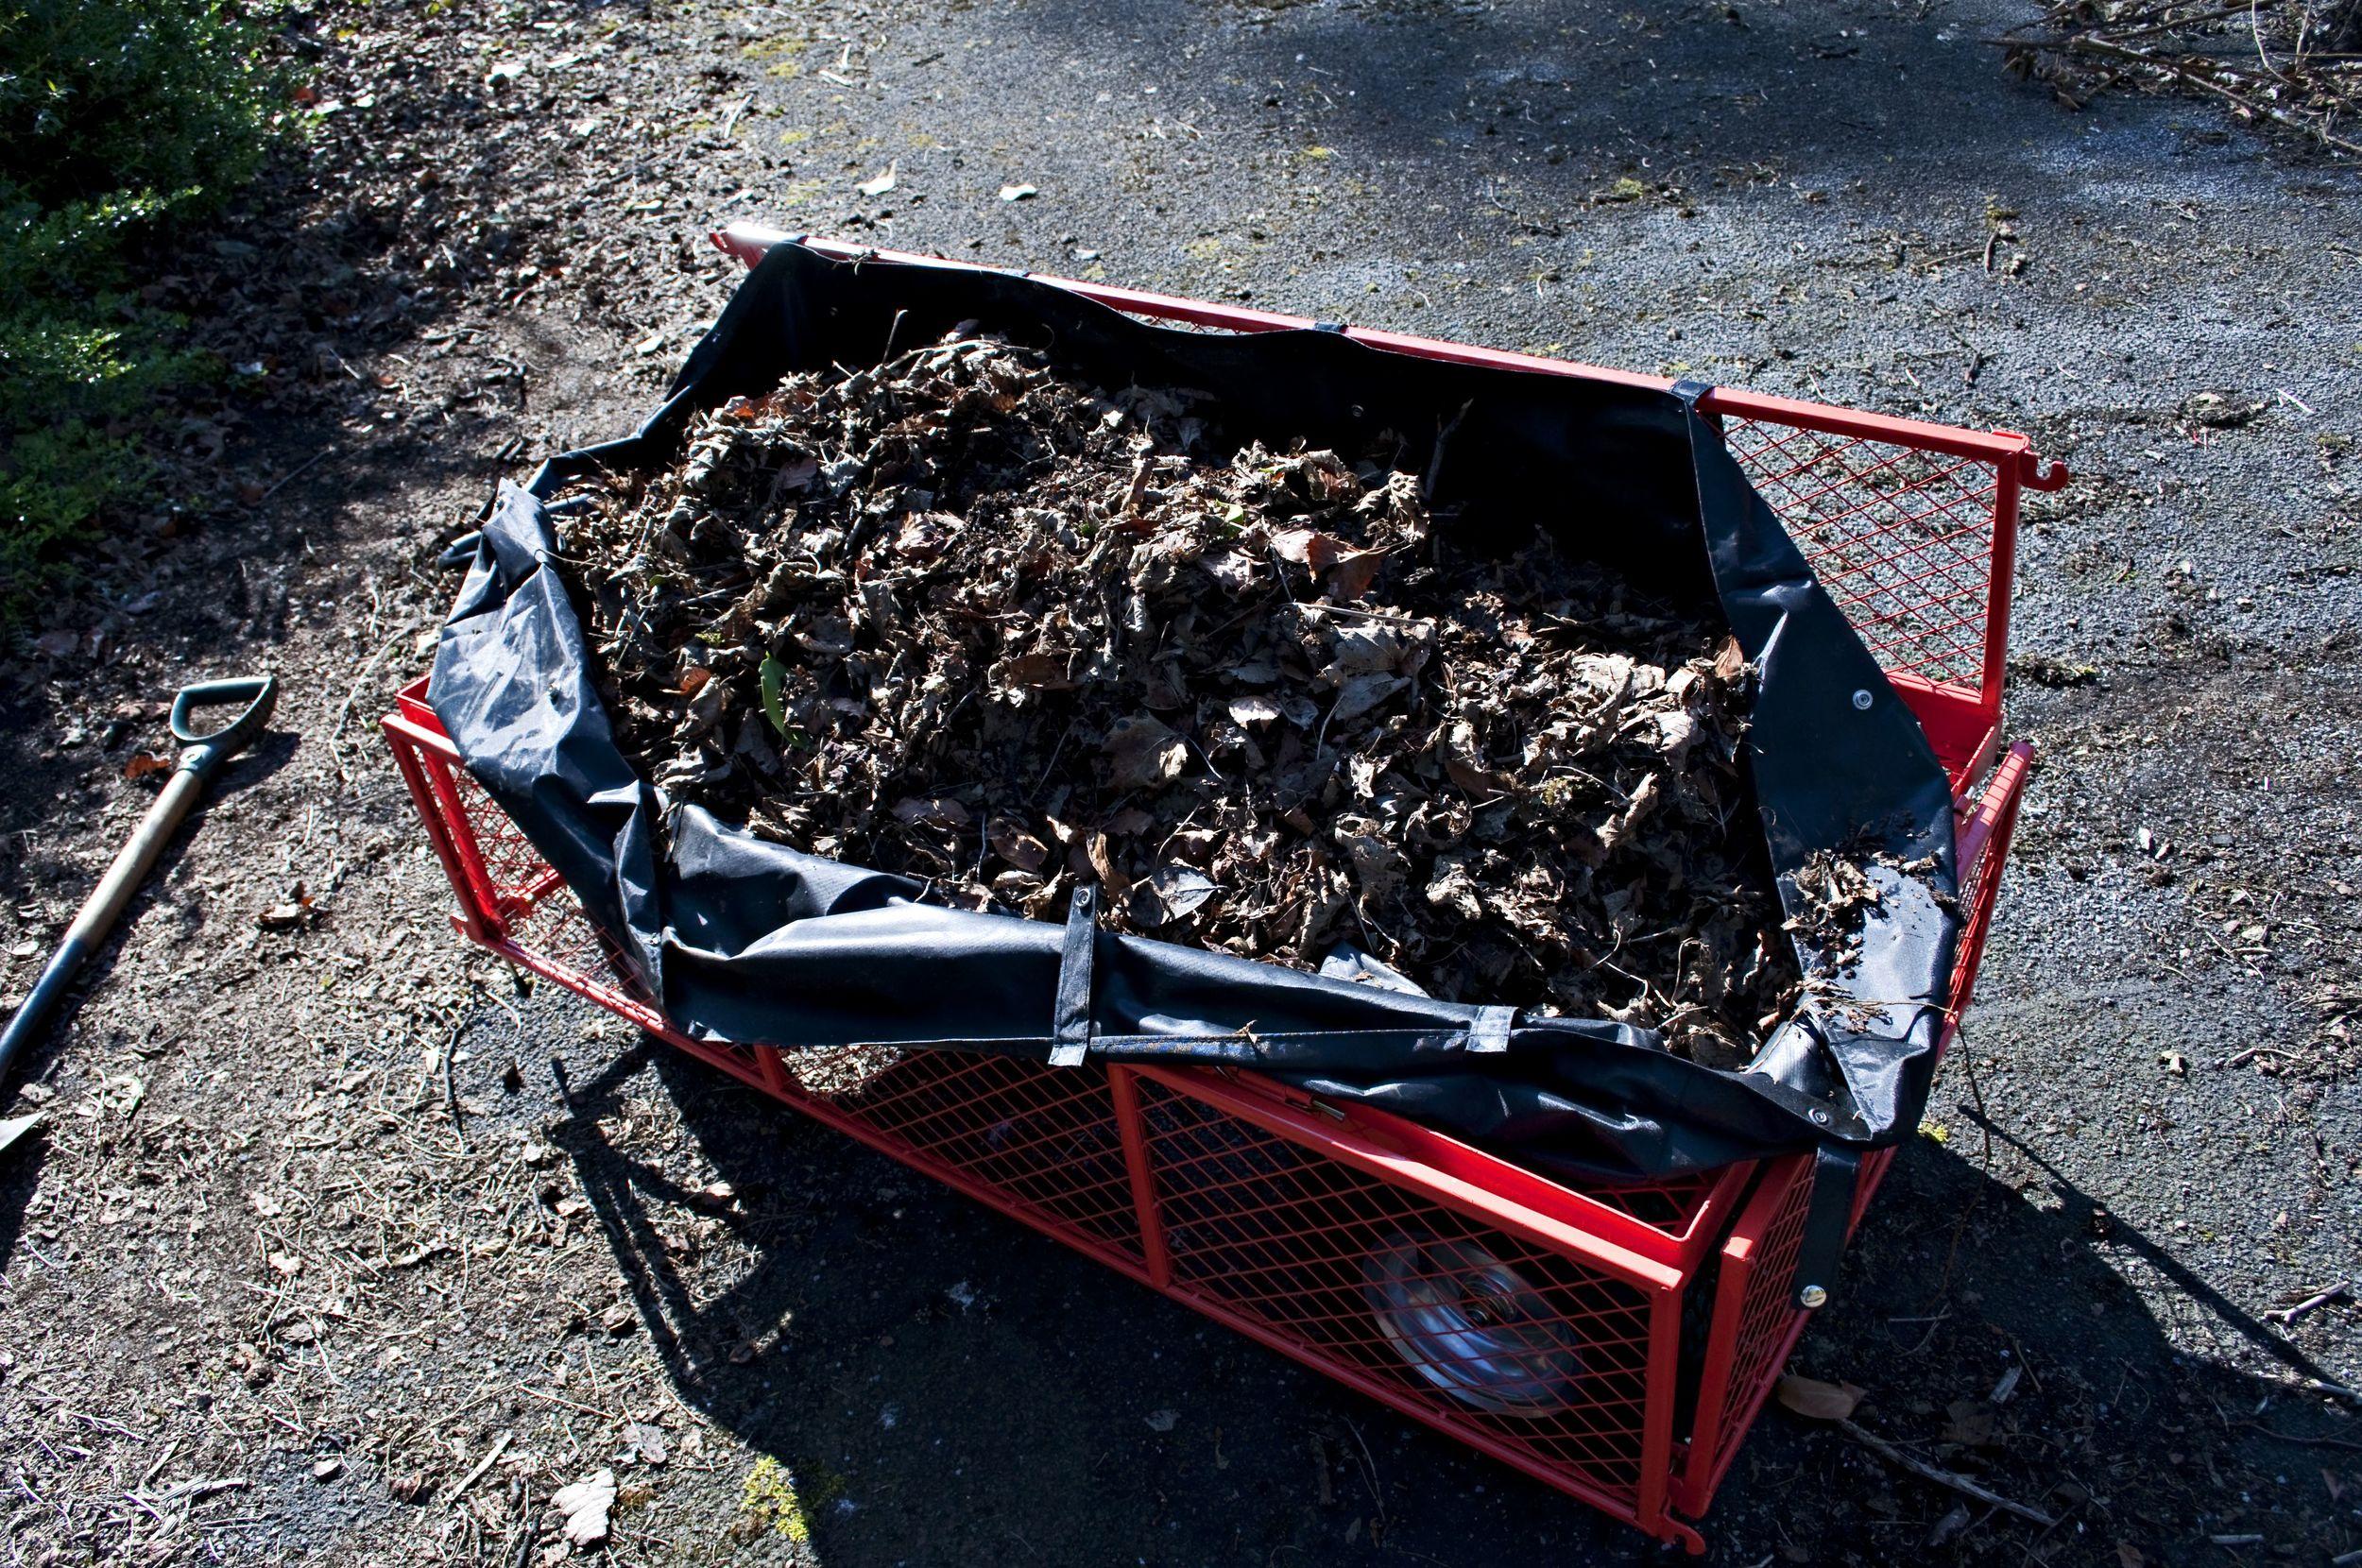 Compost gold - I hope